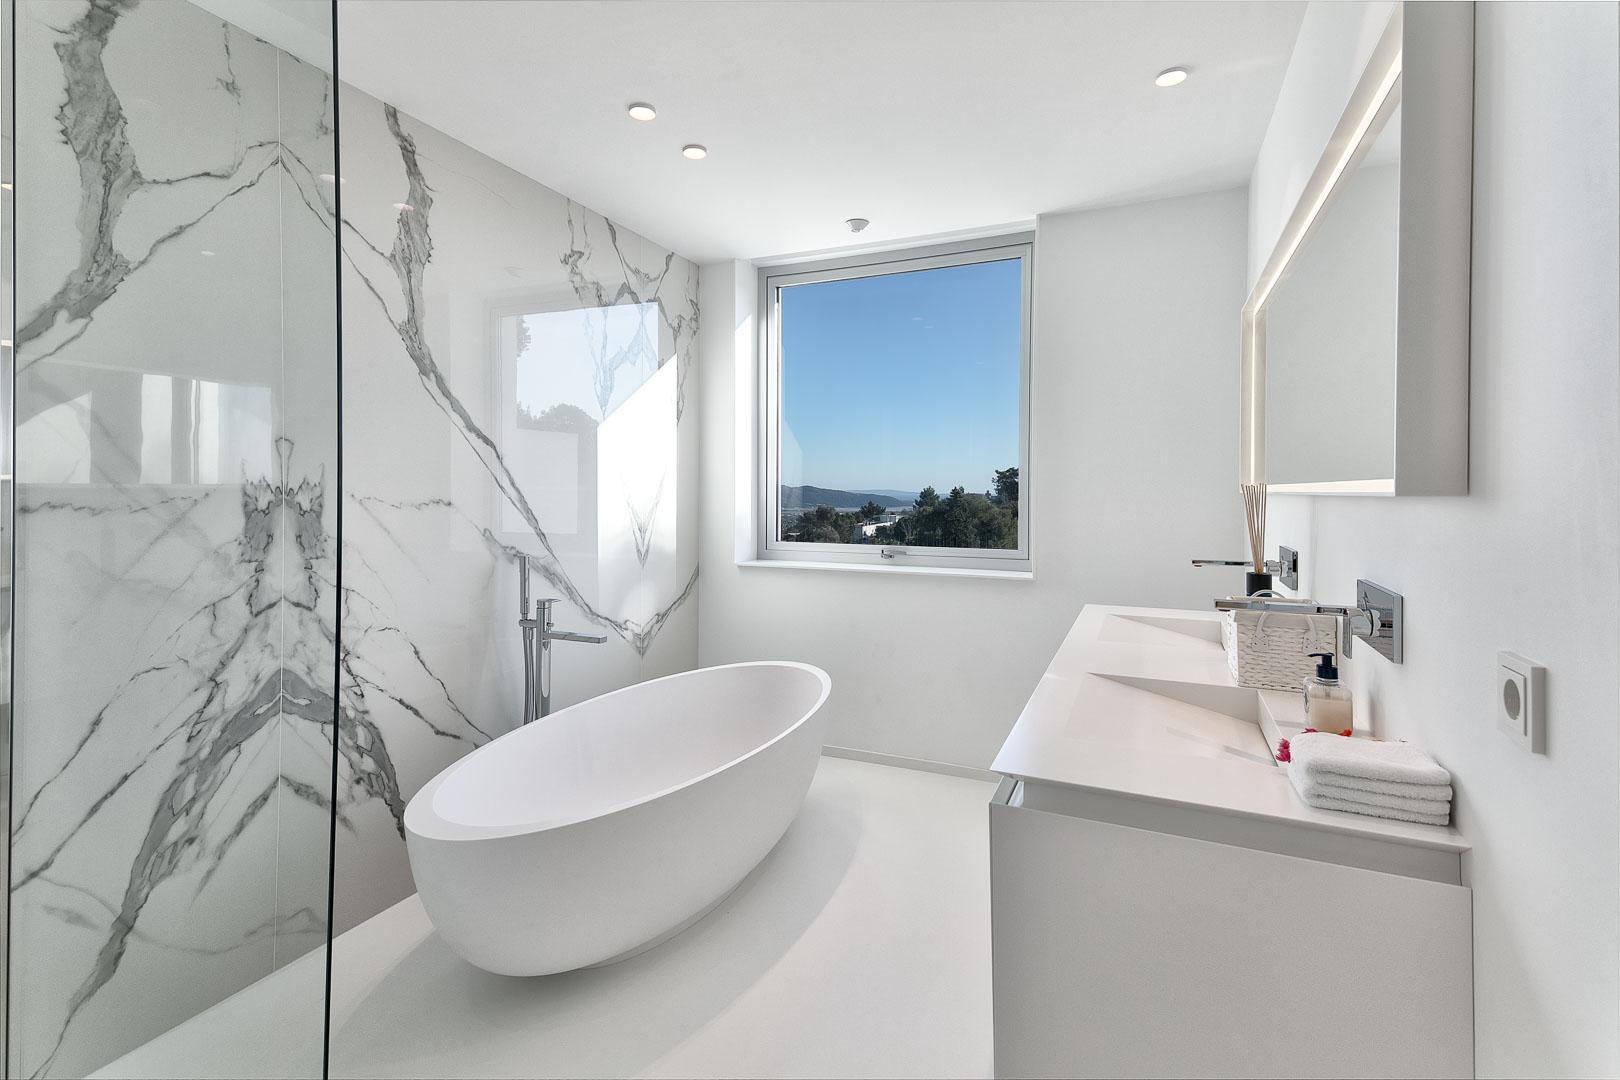 fotografía profesional real estate de baño interior de villa privada en Ibiza